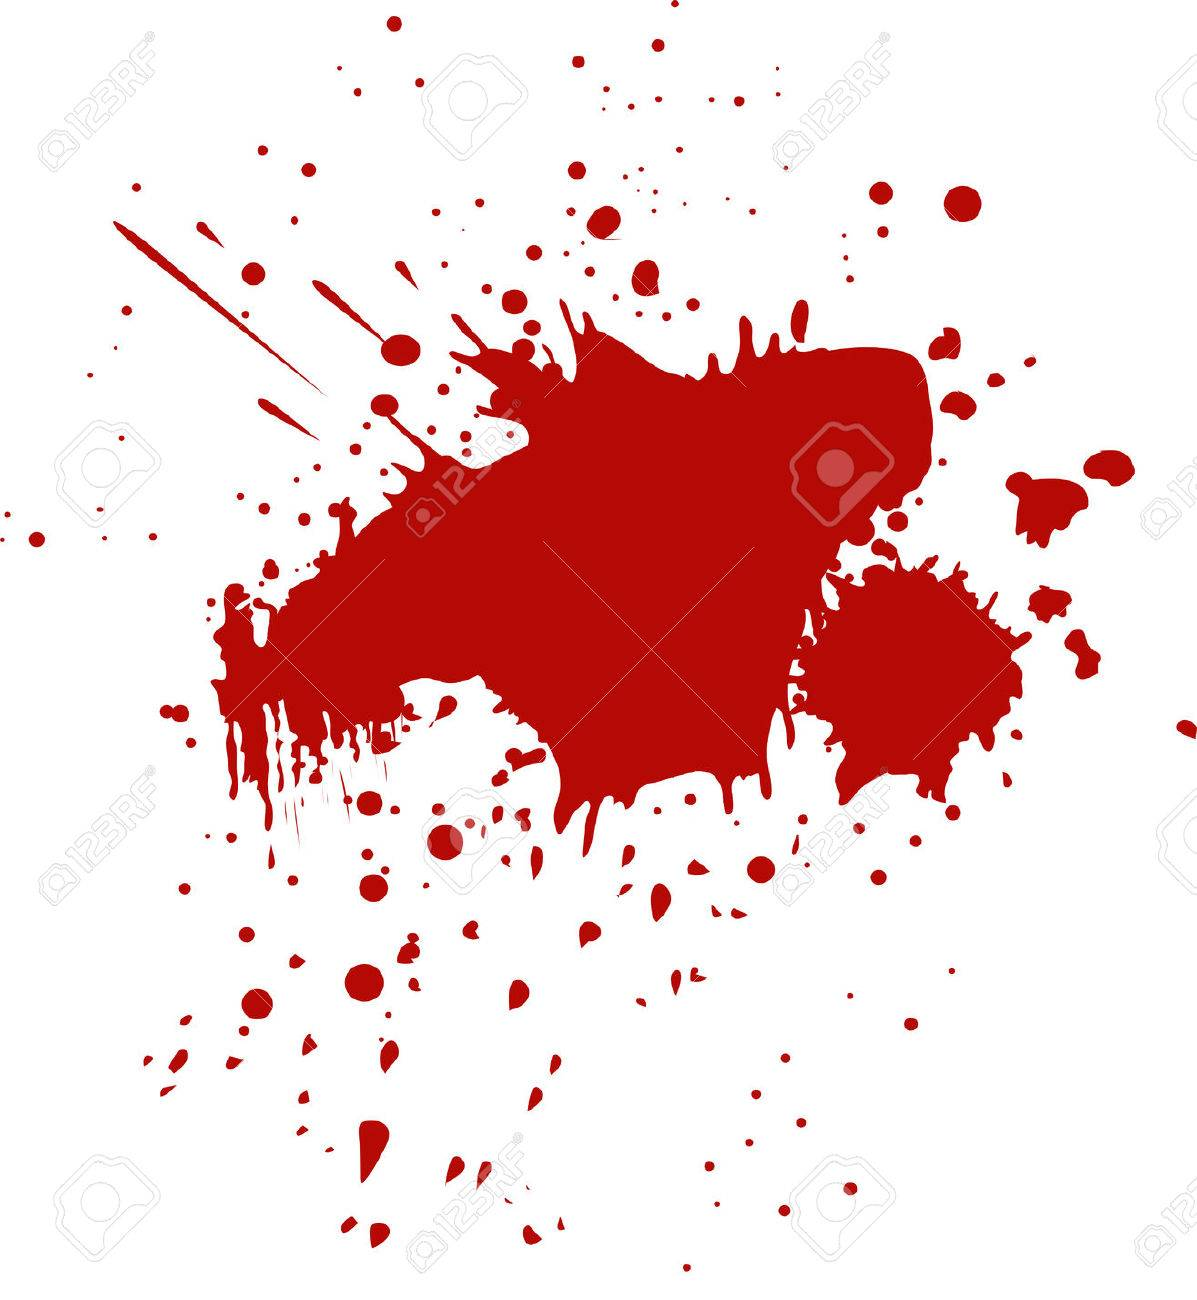 hight resolution of blood splatter stock vector 34918135